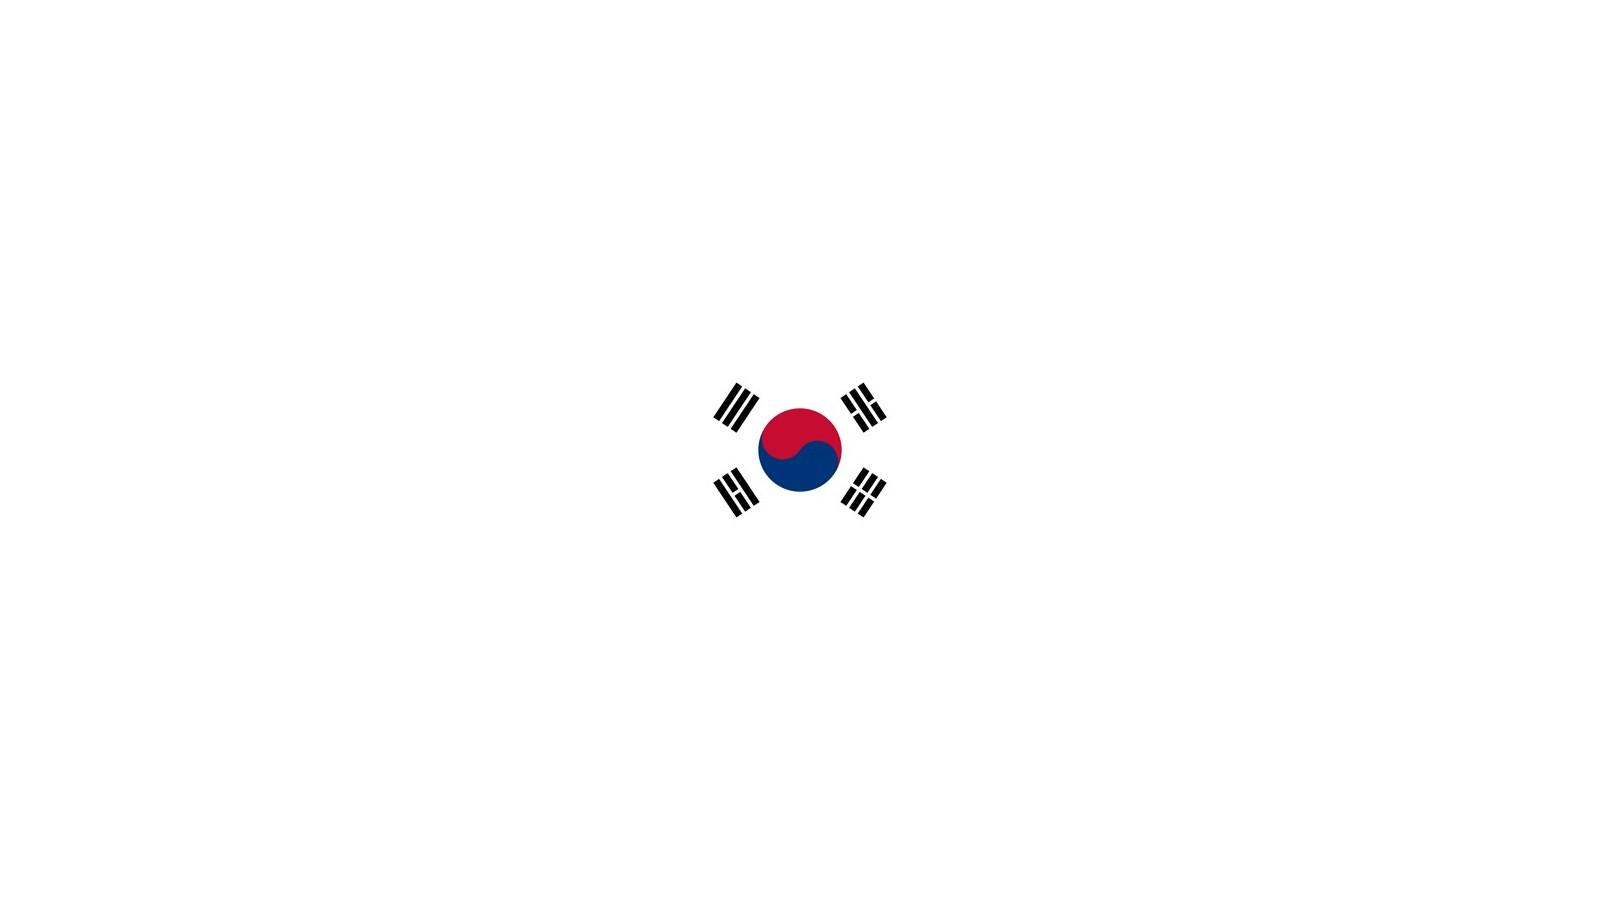 Korean - zh